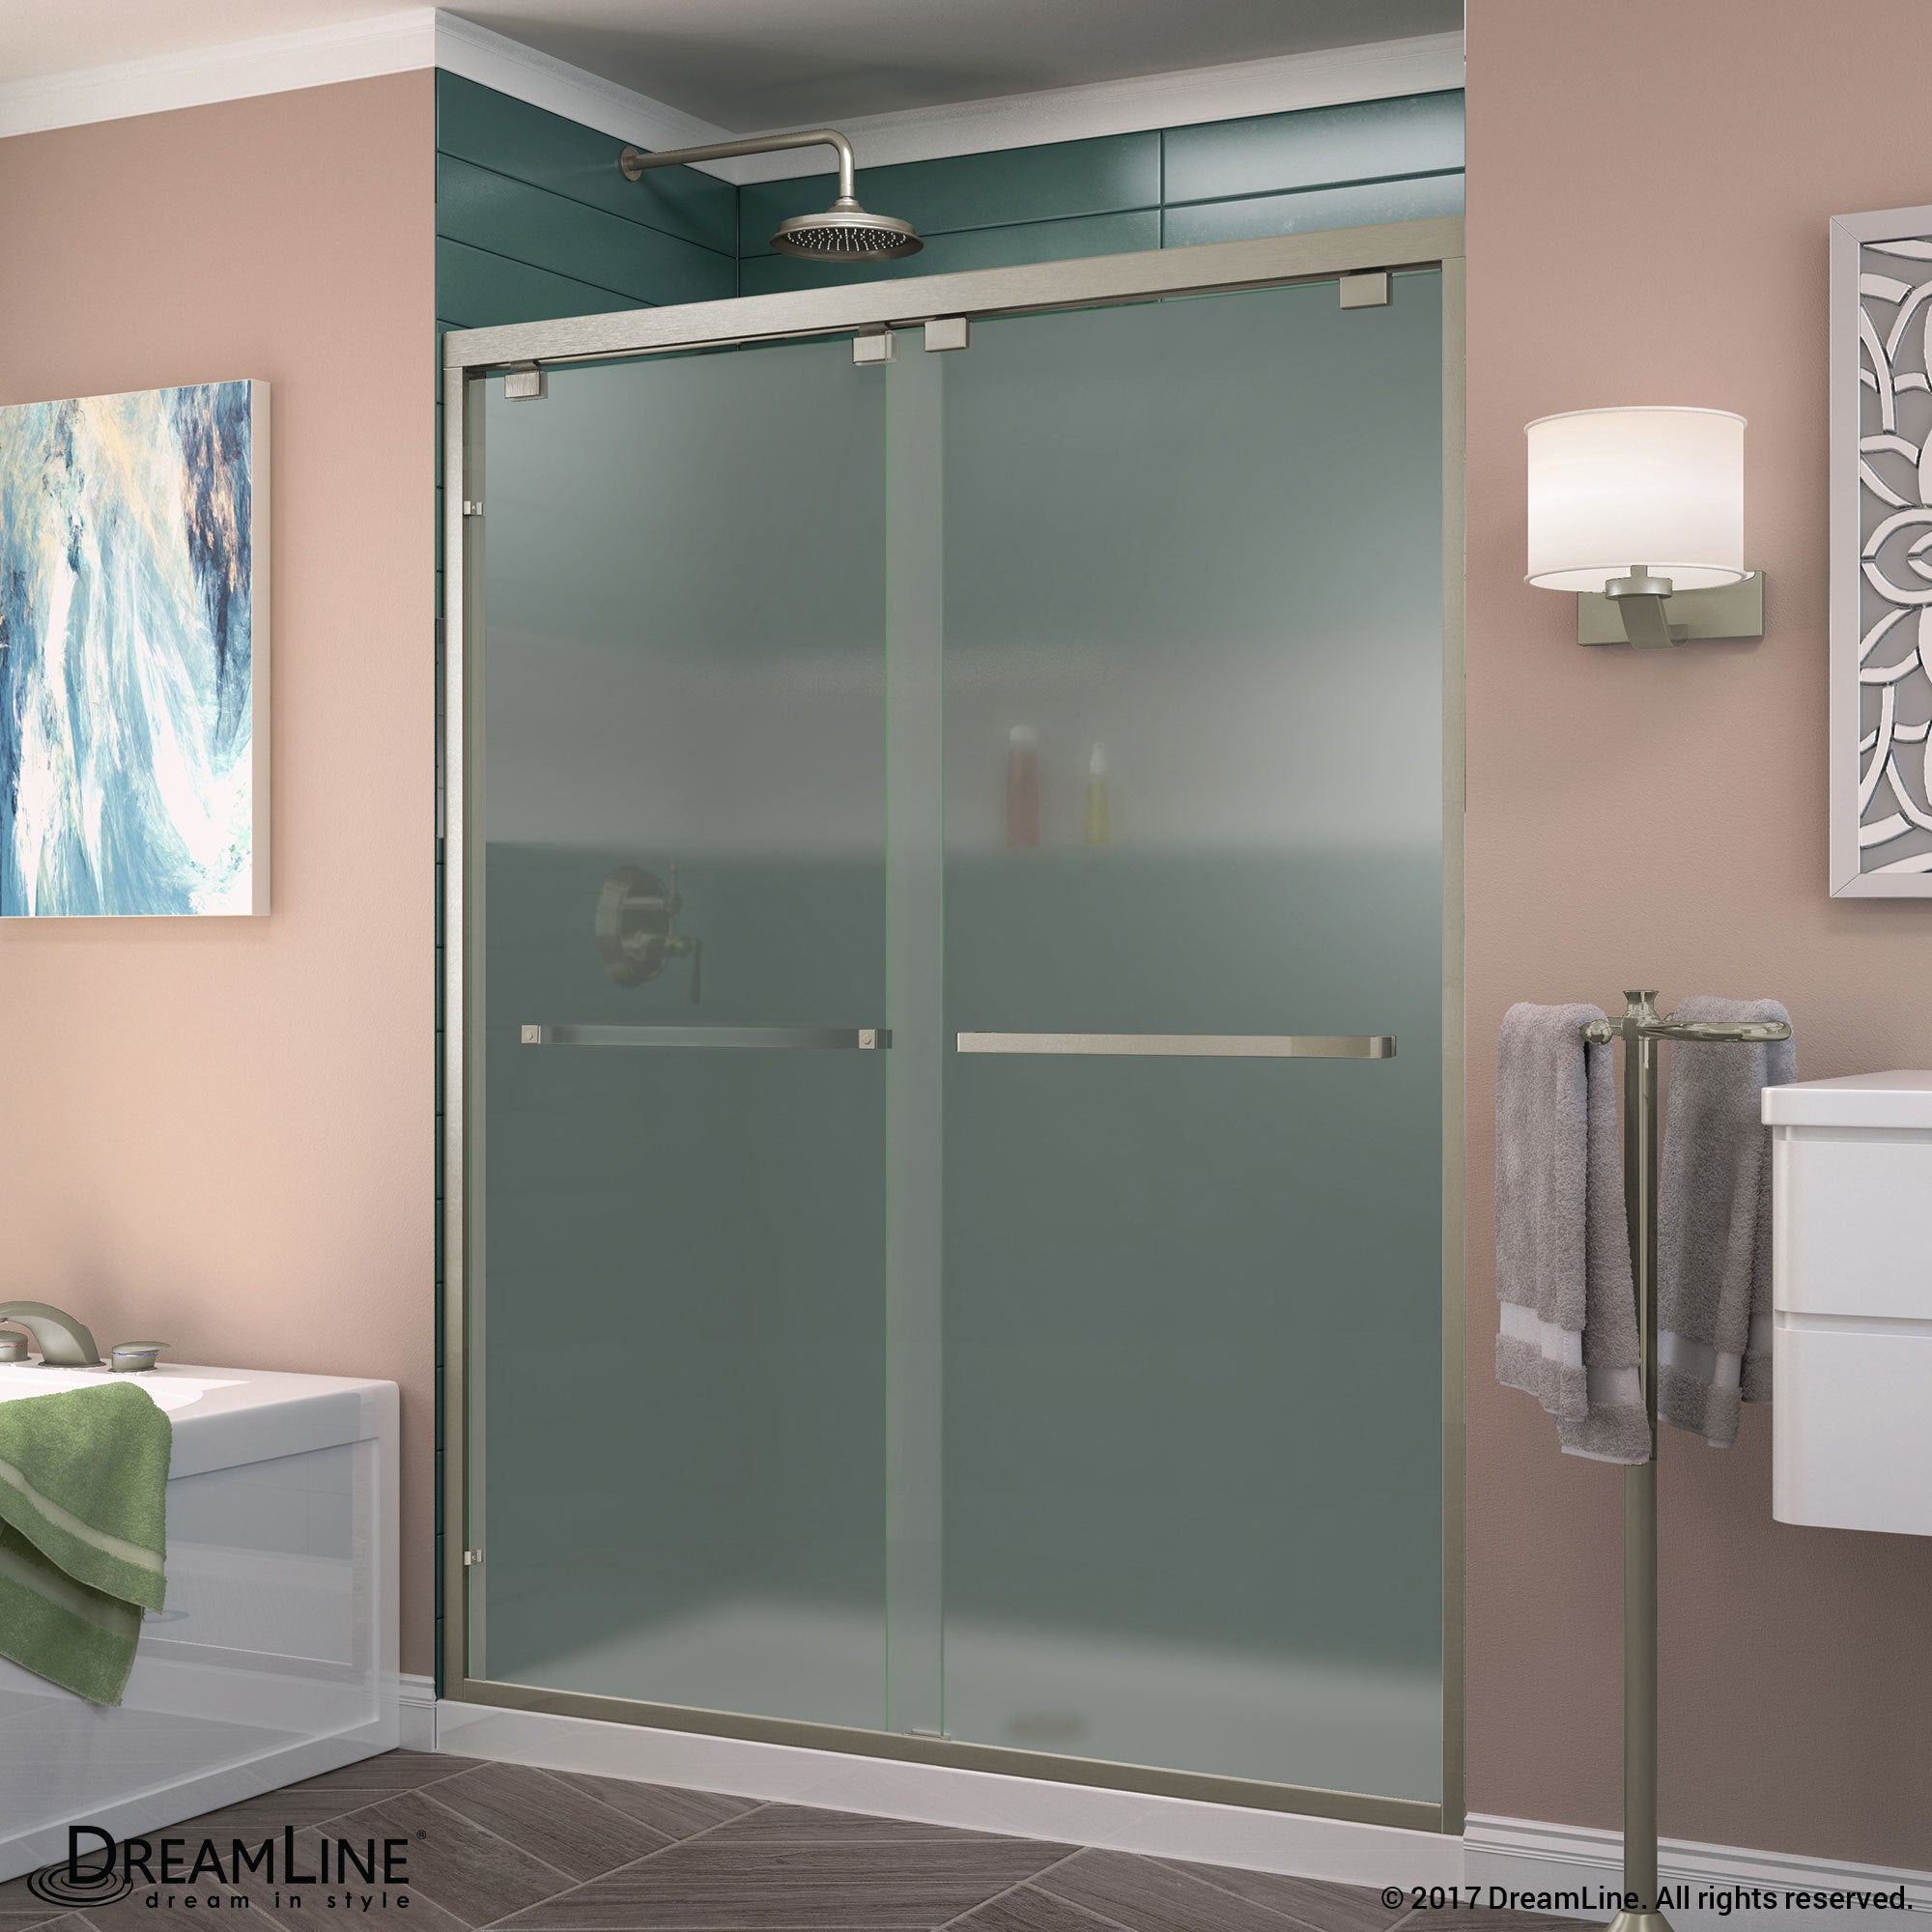 Dreamline Encore 56 60 In W X 76 In H Semi Frameless Bypass Sliding Shower Door Frosted Glass 56 60 W